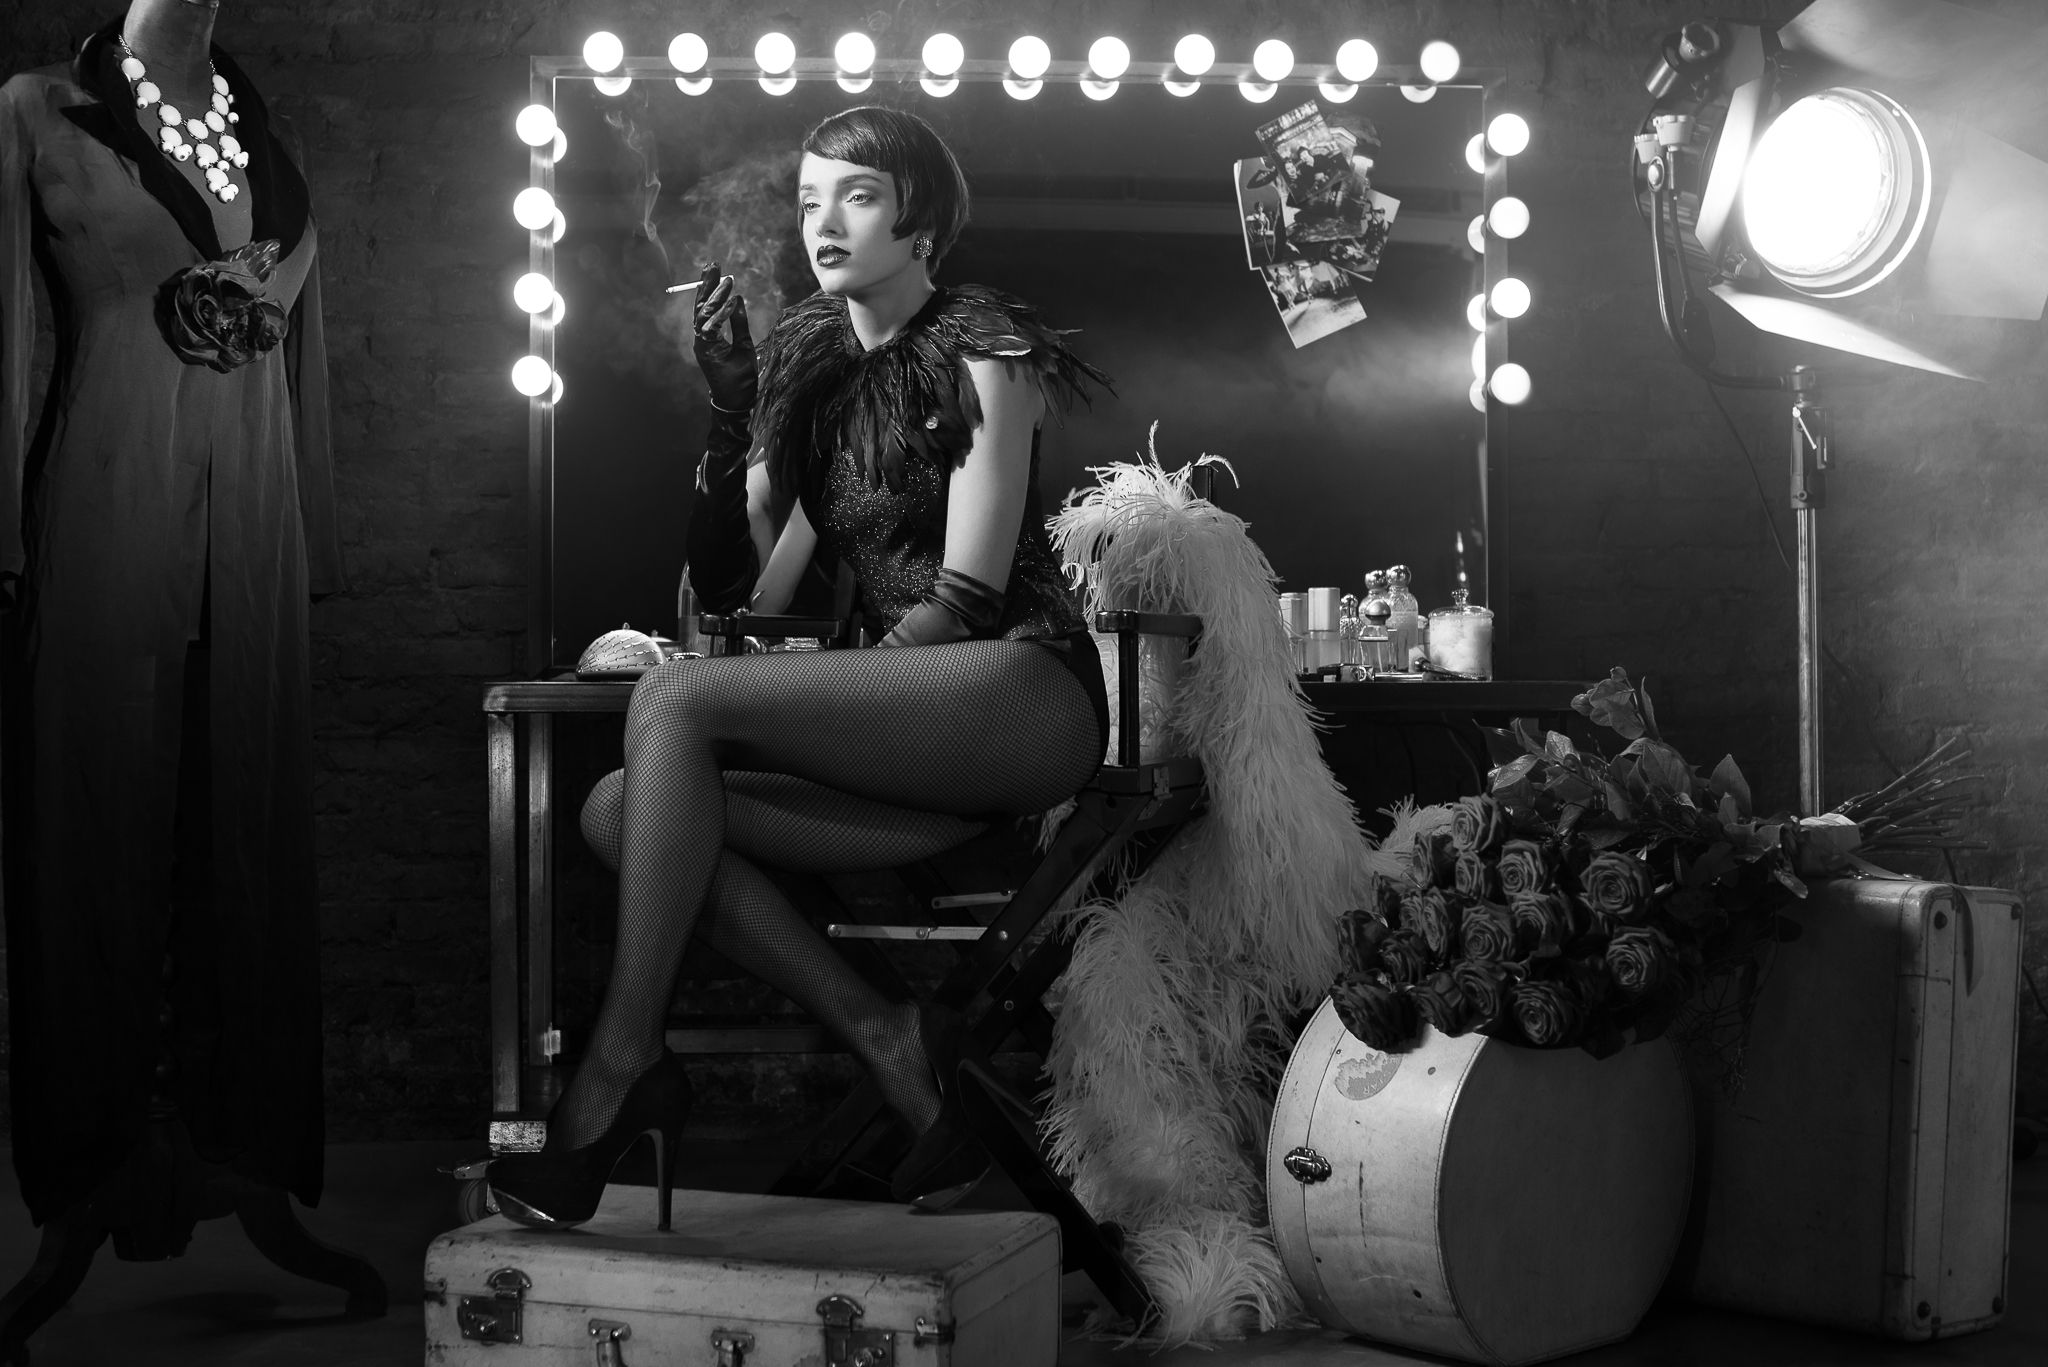 Editorial - Diva en Noir - Pic. 4